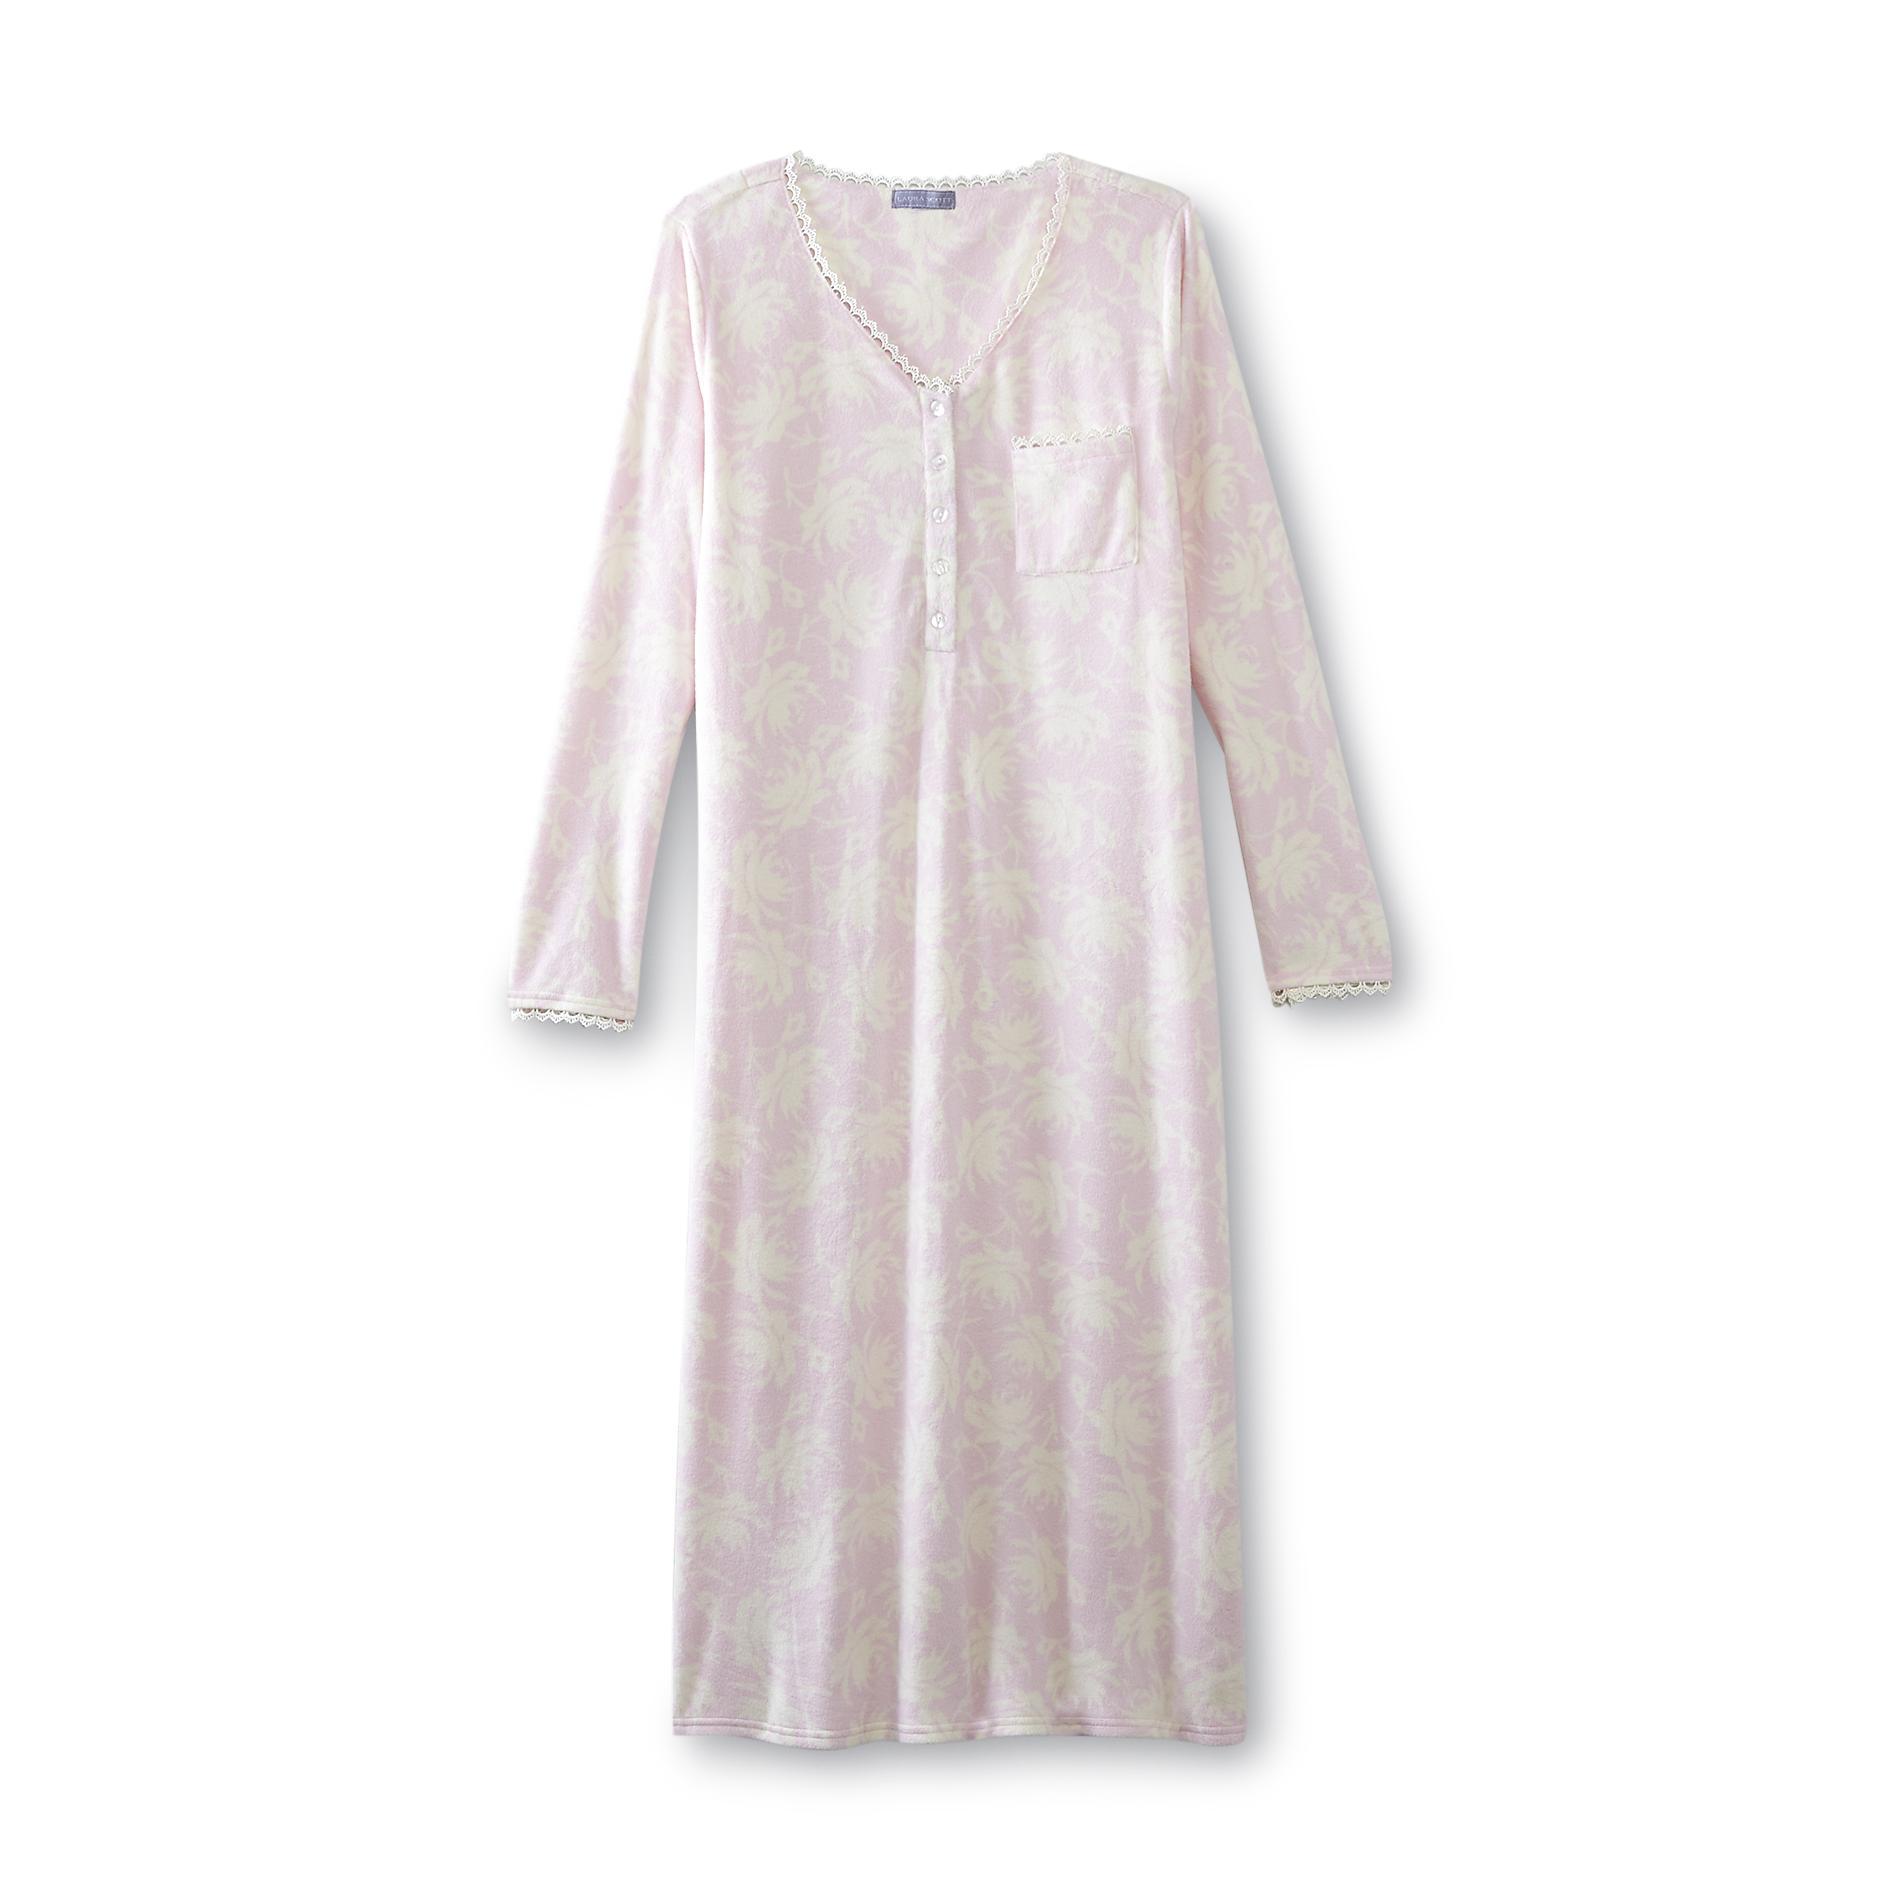 Women's Fleece Nightgown - Floral